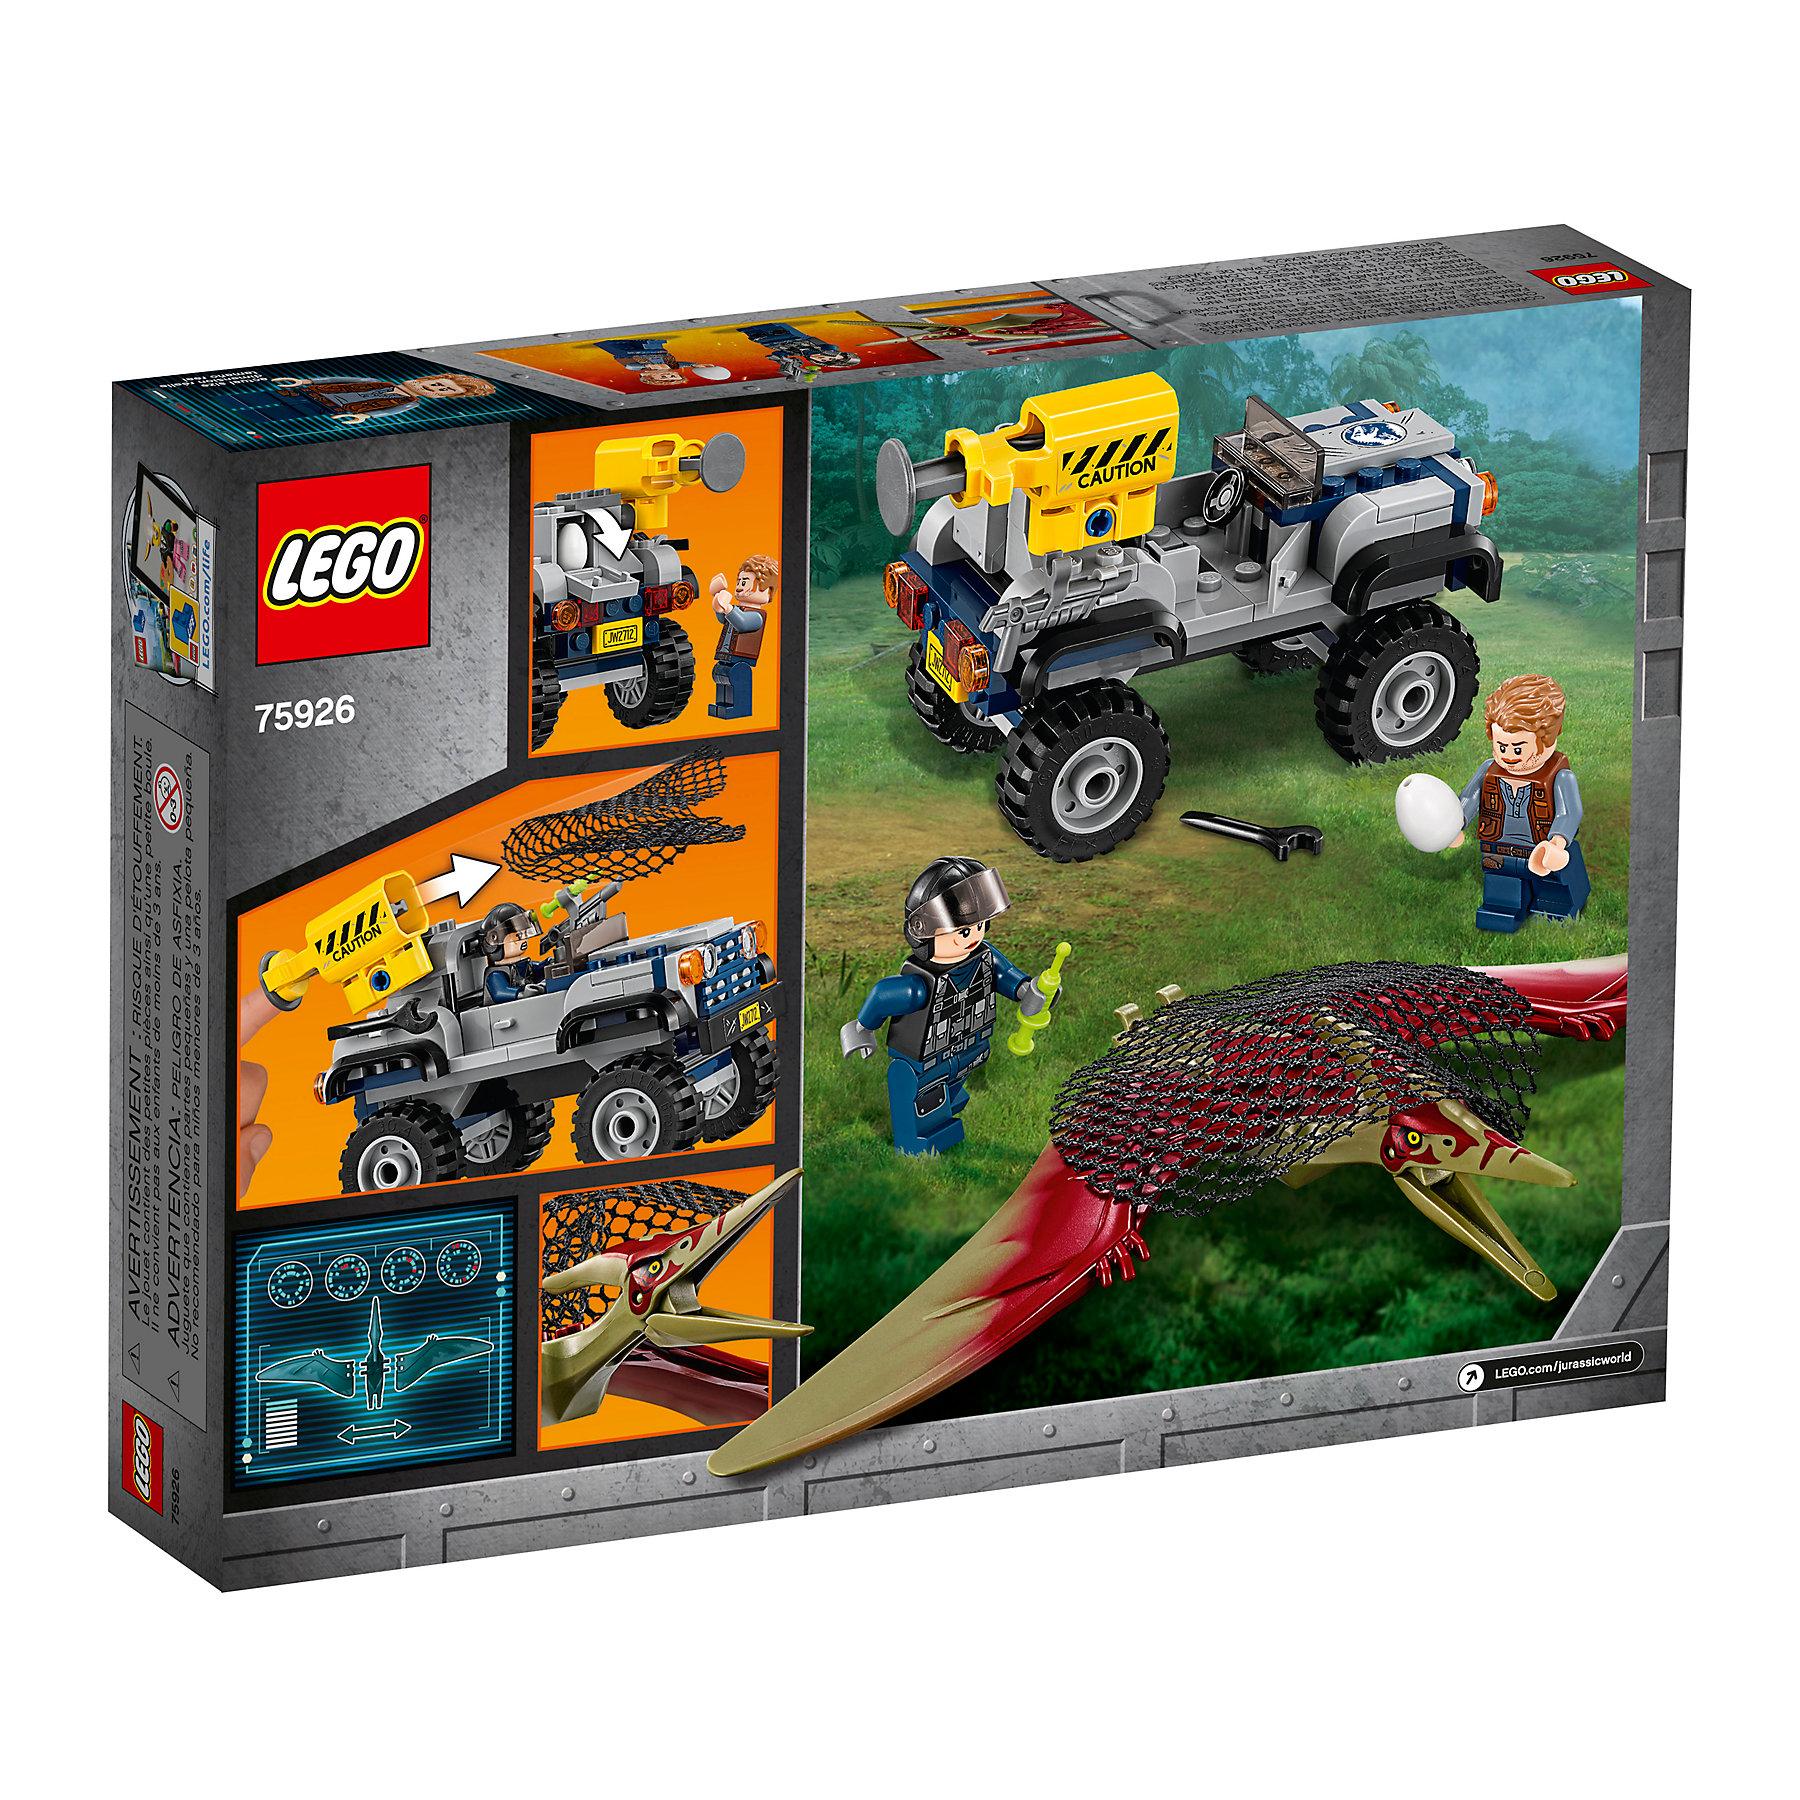 75926 126pcs LEGO Jurassic World Pteranodon Chase NEW